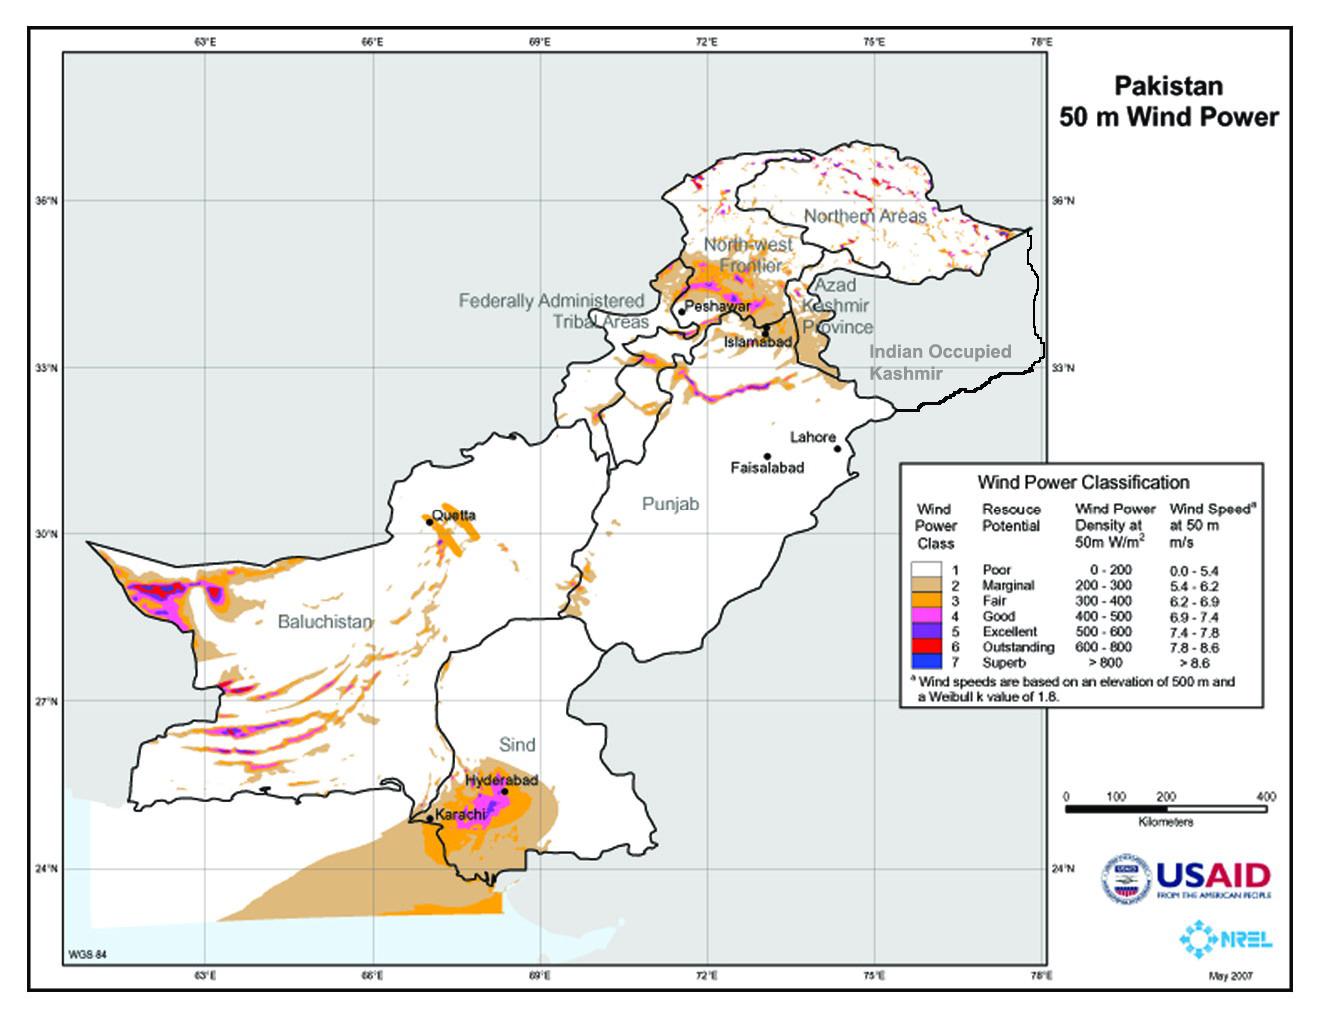 https://www.evwind.es/wp-content/uploads/2013/02/wind-energy-pakistan.jpg